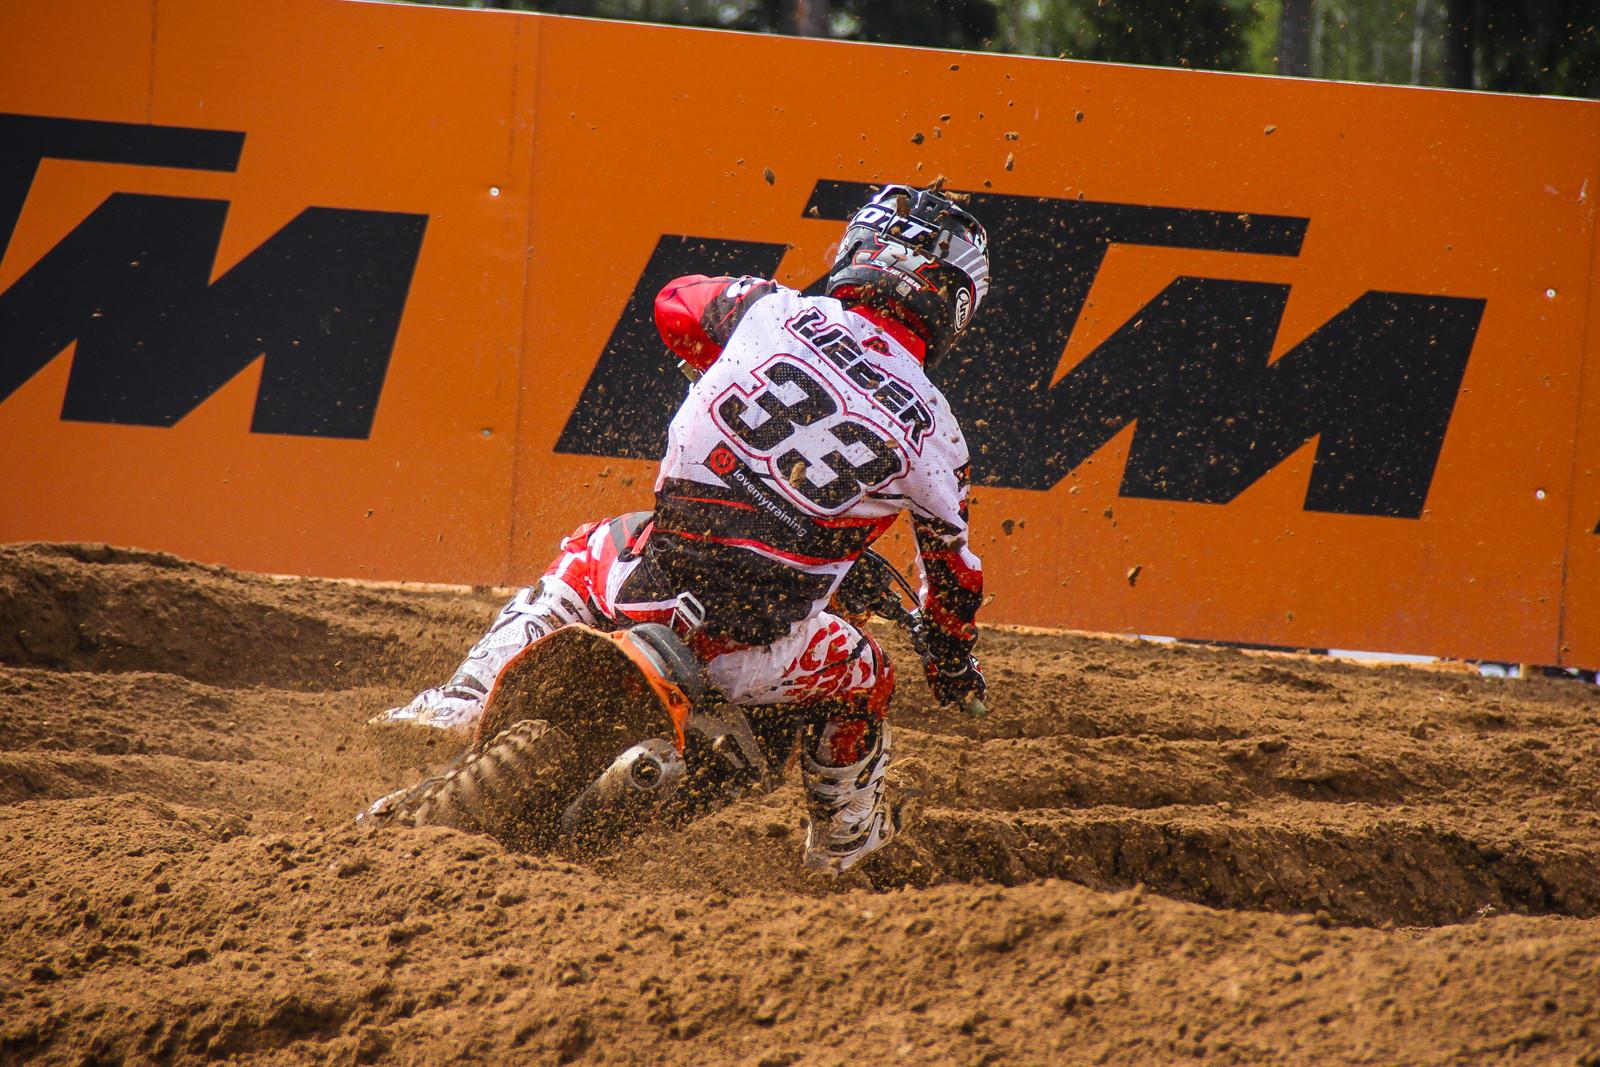 Julien Lieber - Photo Blast: 2017 MXGP of Latvia - Motocross Pictures - Vital MX